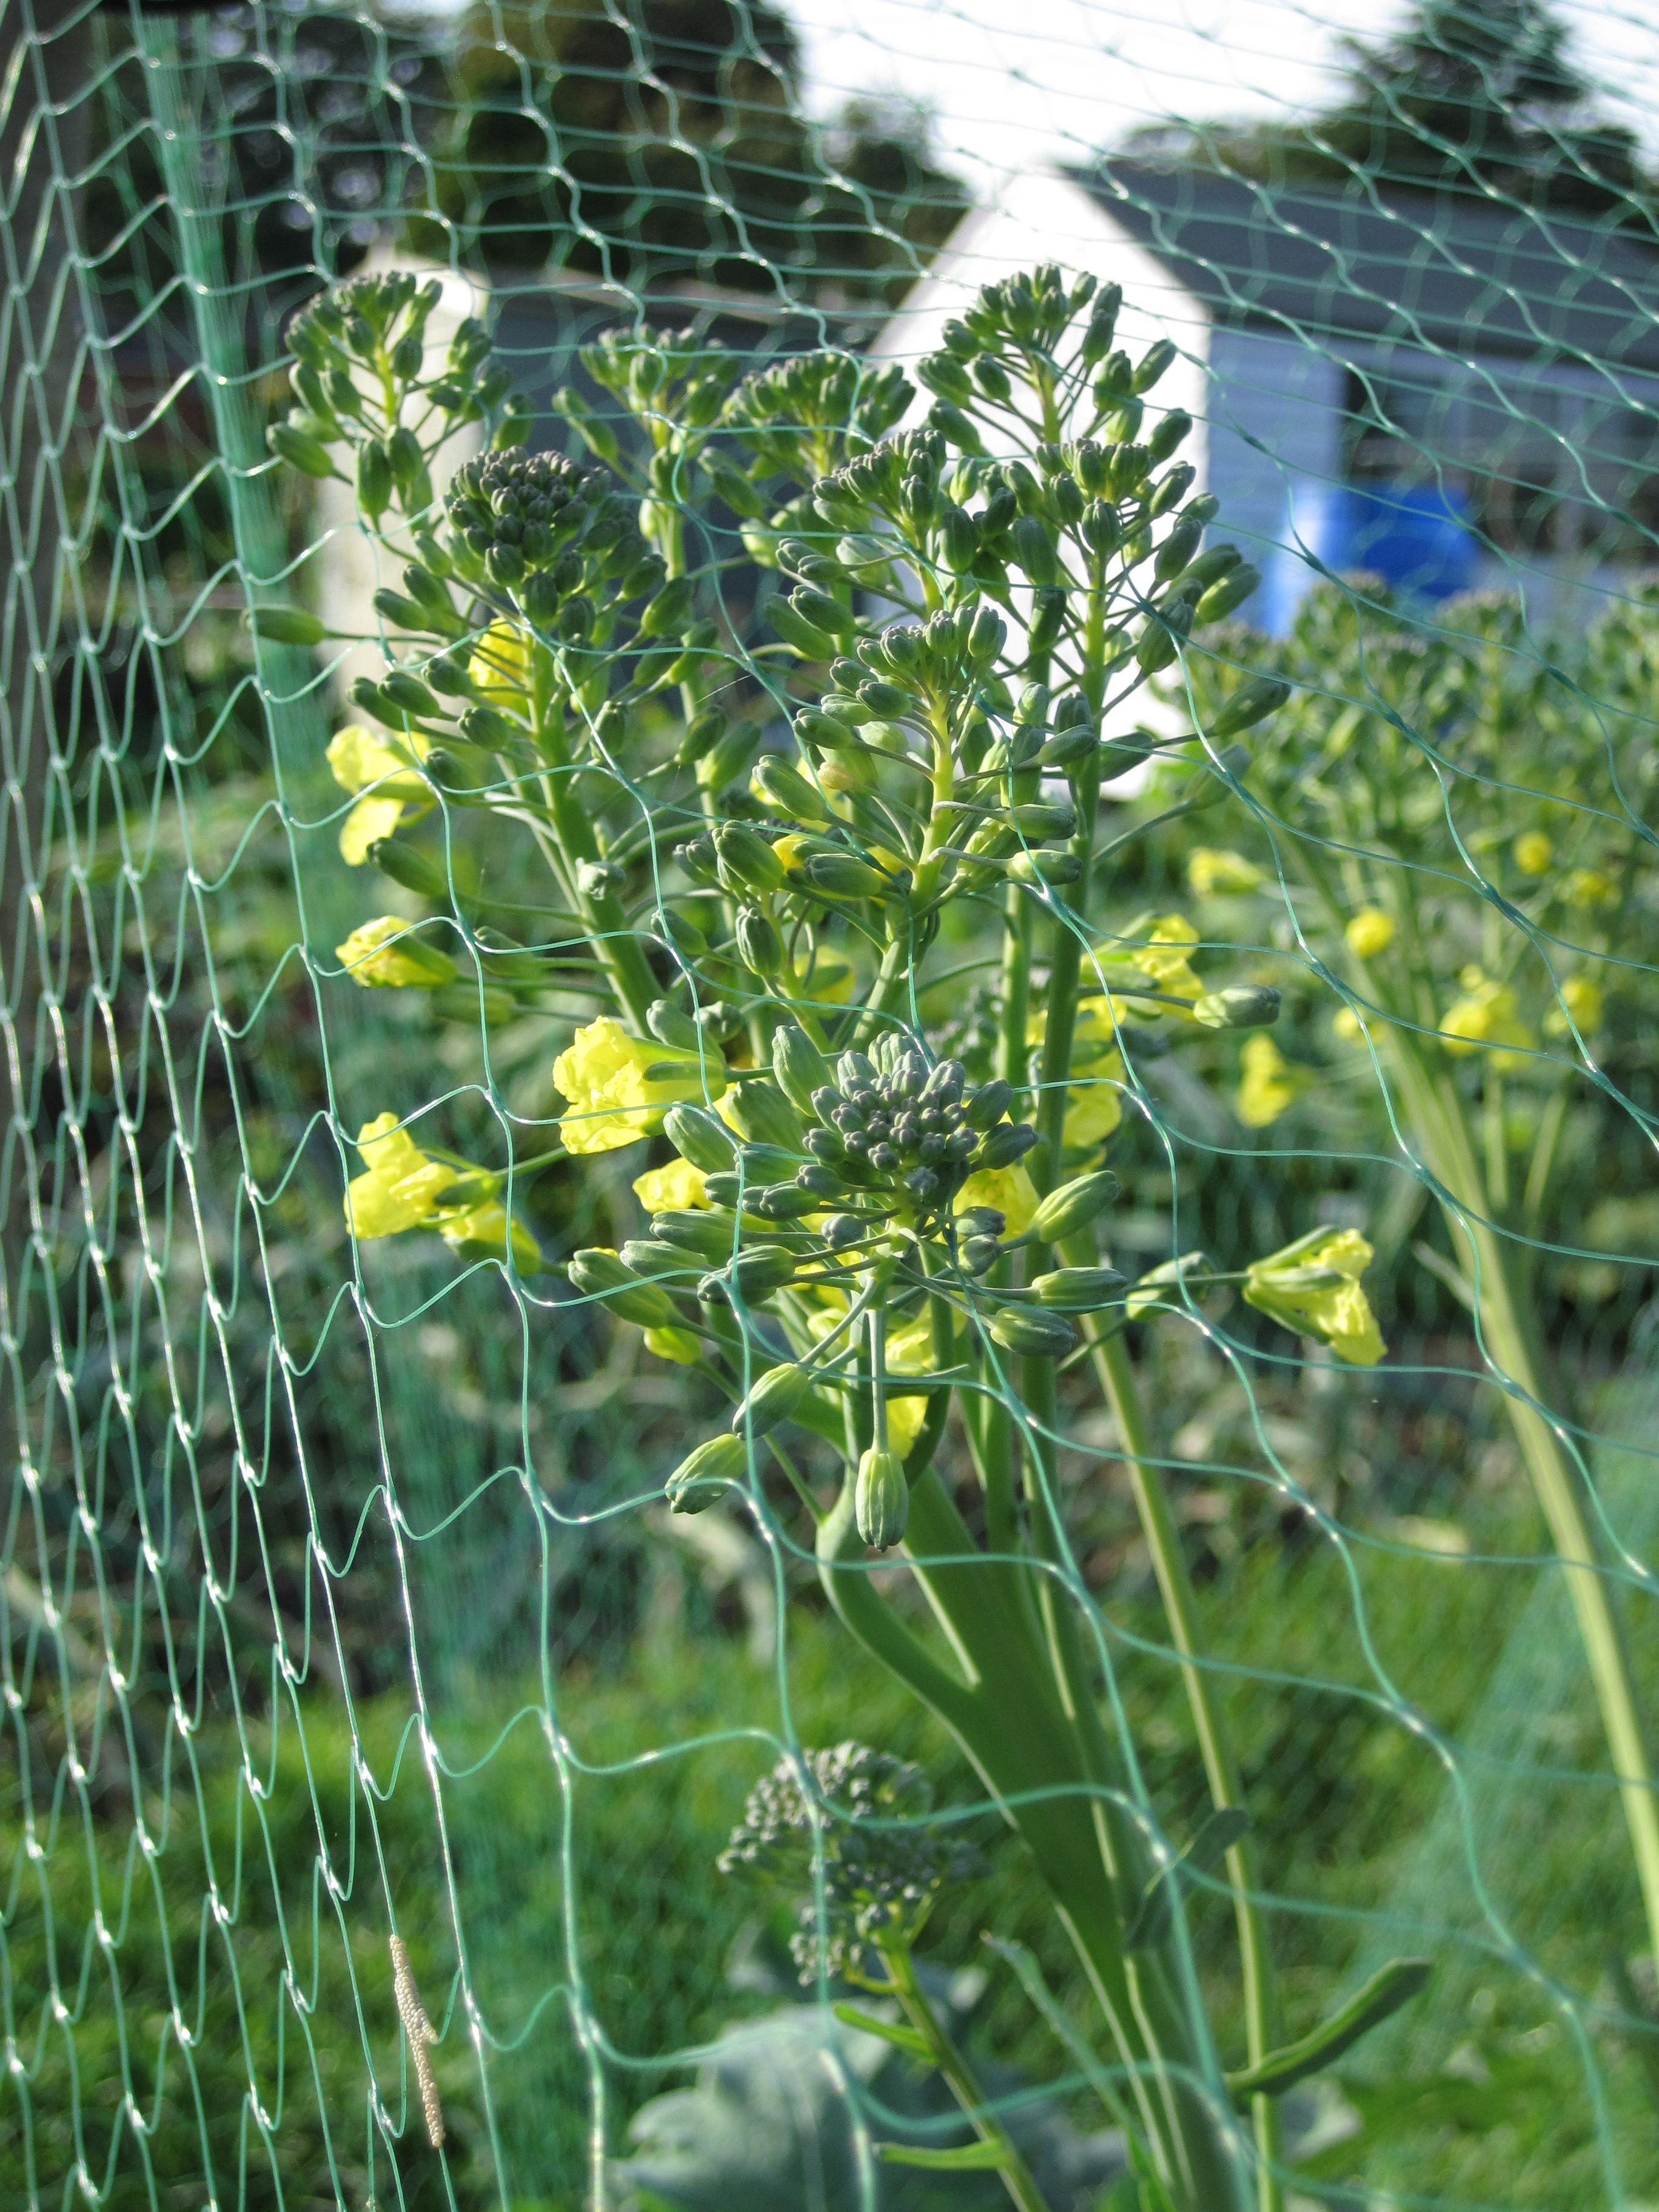 Yellow flowers on the broccoli mail online david derbyshires img3431 mightylinksfo